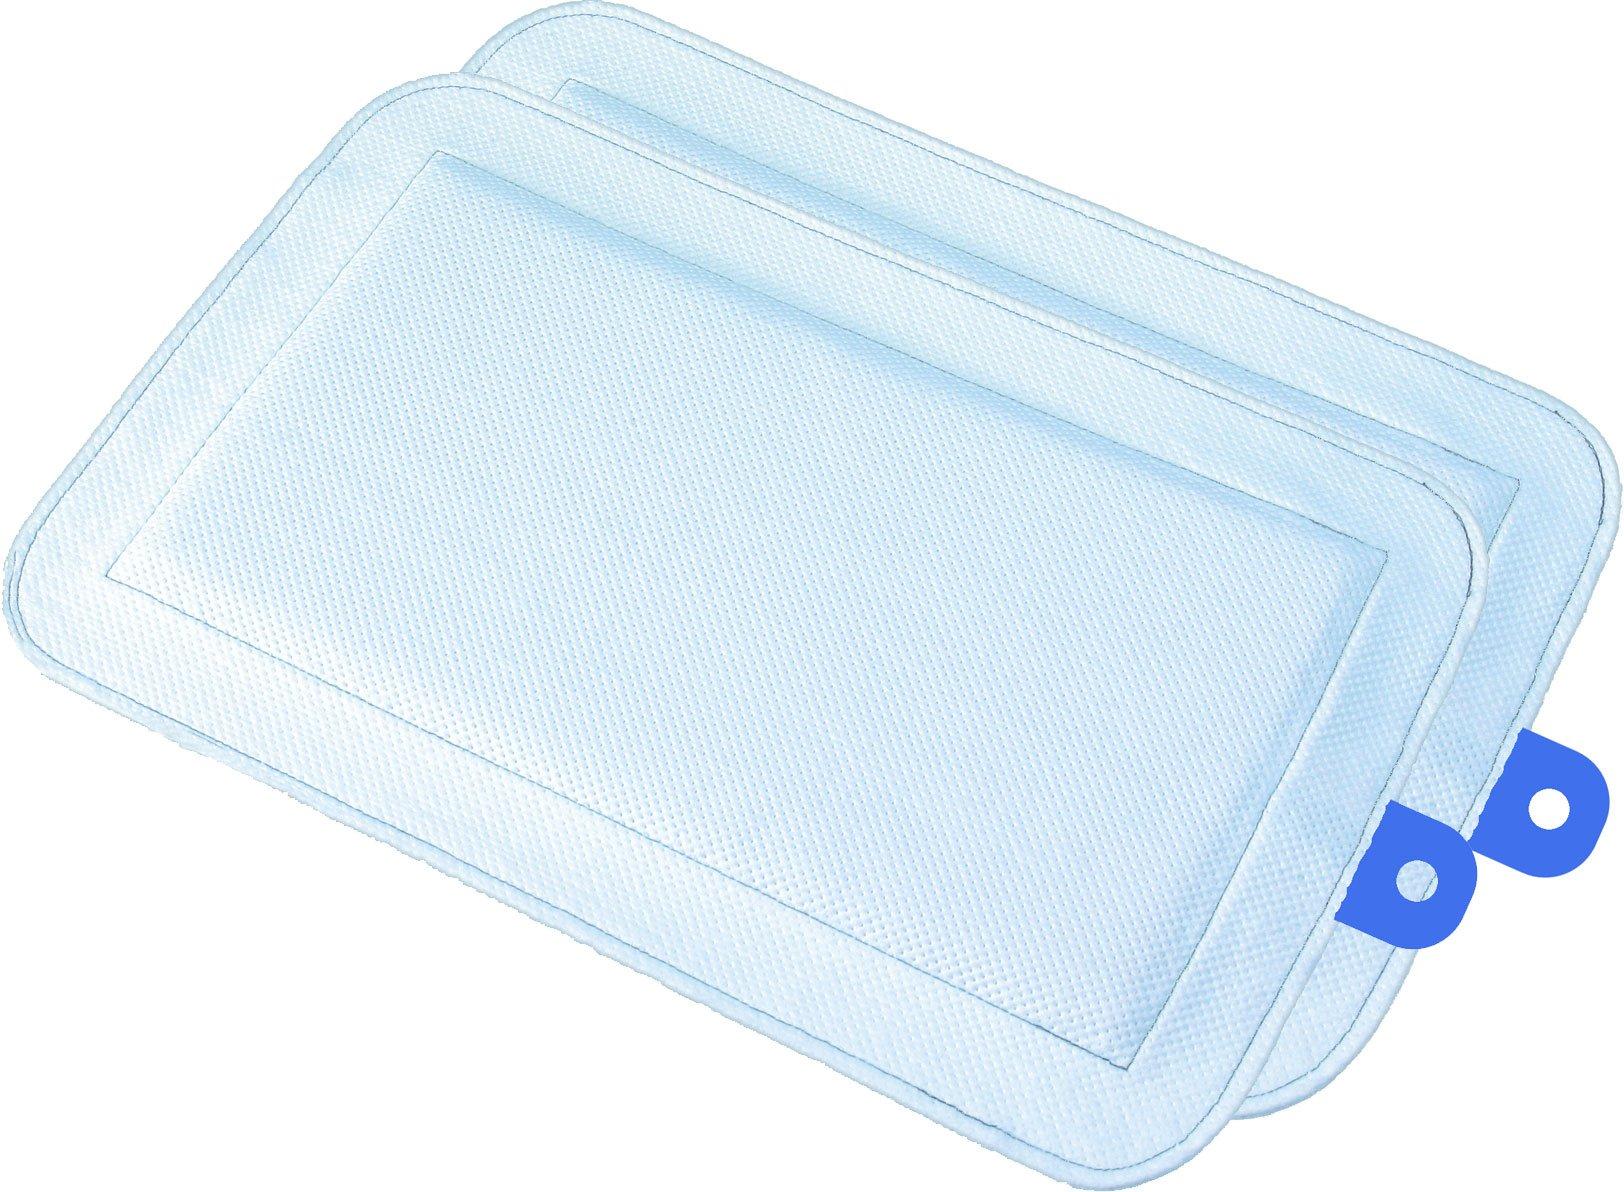 DryFur Pet Carrier Insert Pads size Small 19.5'' x 12.5'' Blue - 2 pack by DryFur